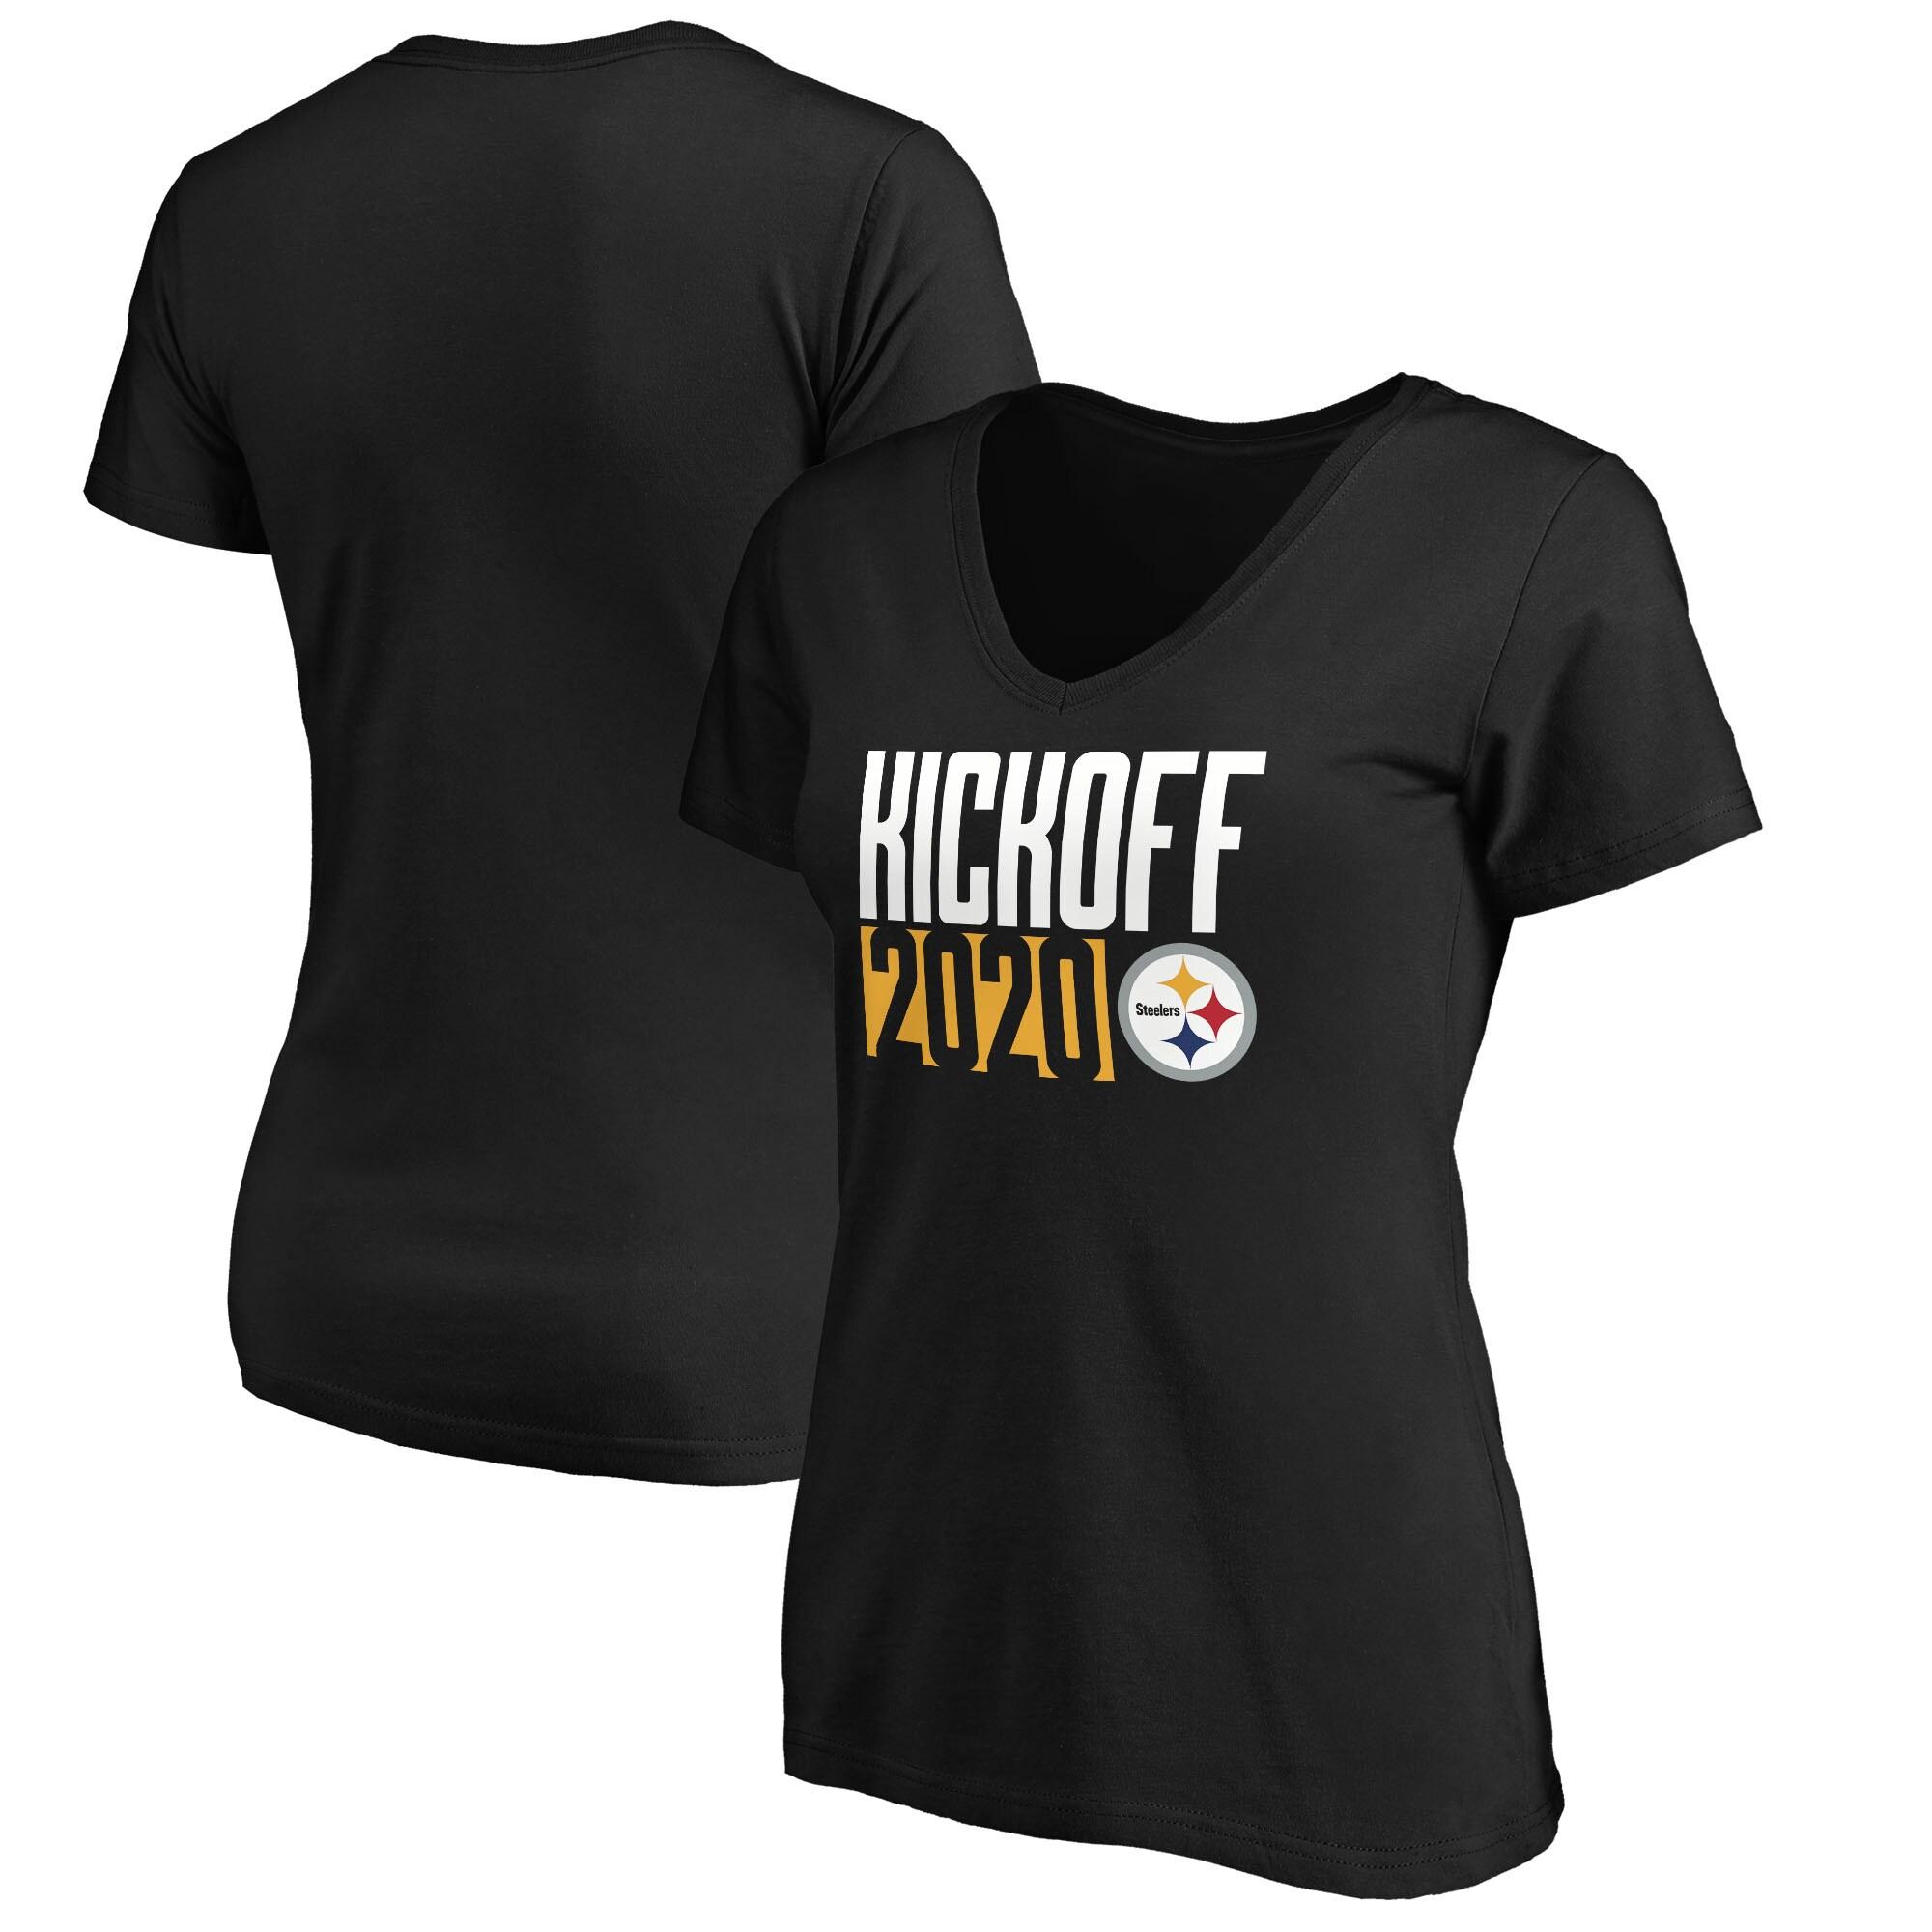 Pittsburgh Steelers Fanatics Branded Women's Kickoff 2020 V-Neck T-Shirt - Black